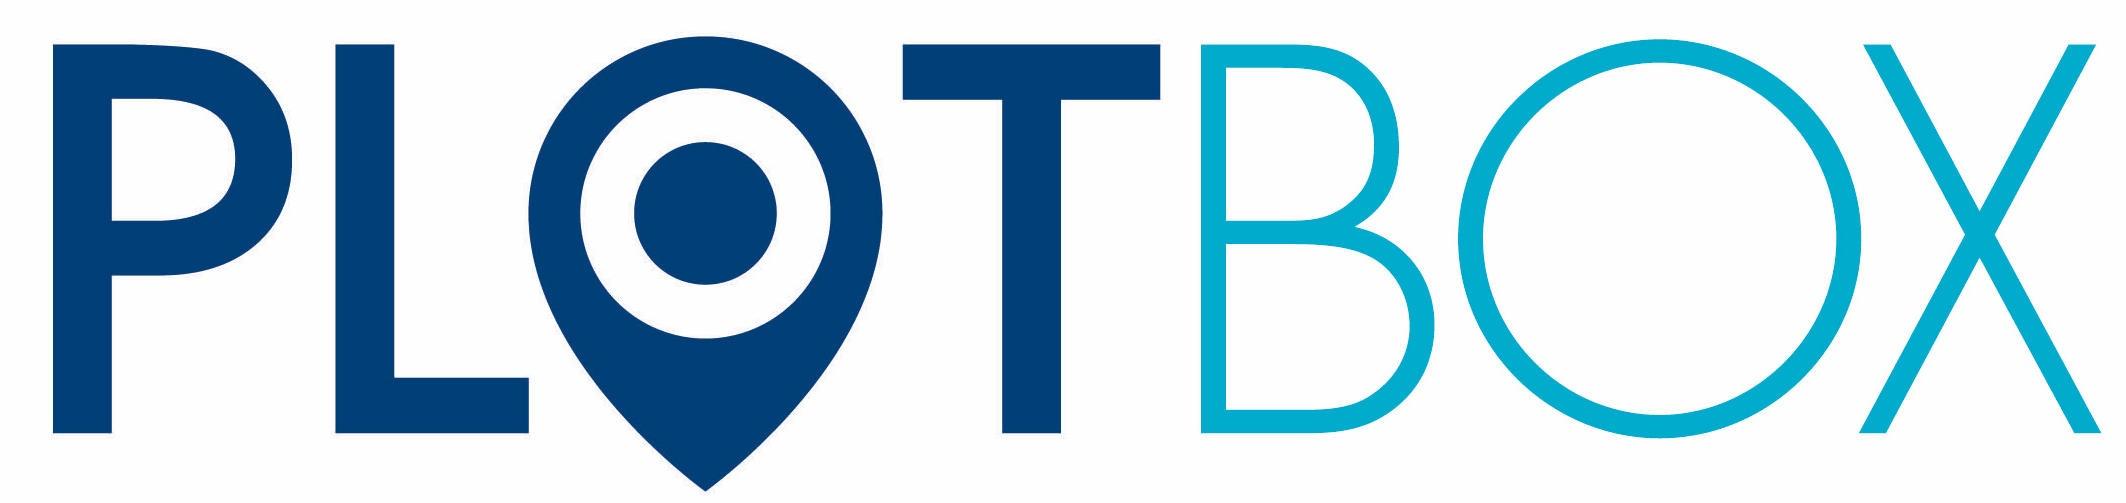 PlotBox New Logo 2018 .jpeg